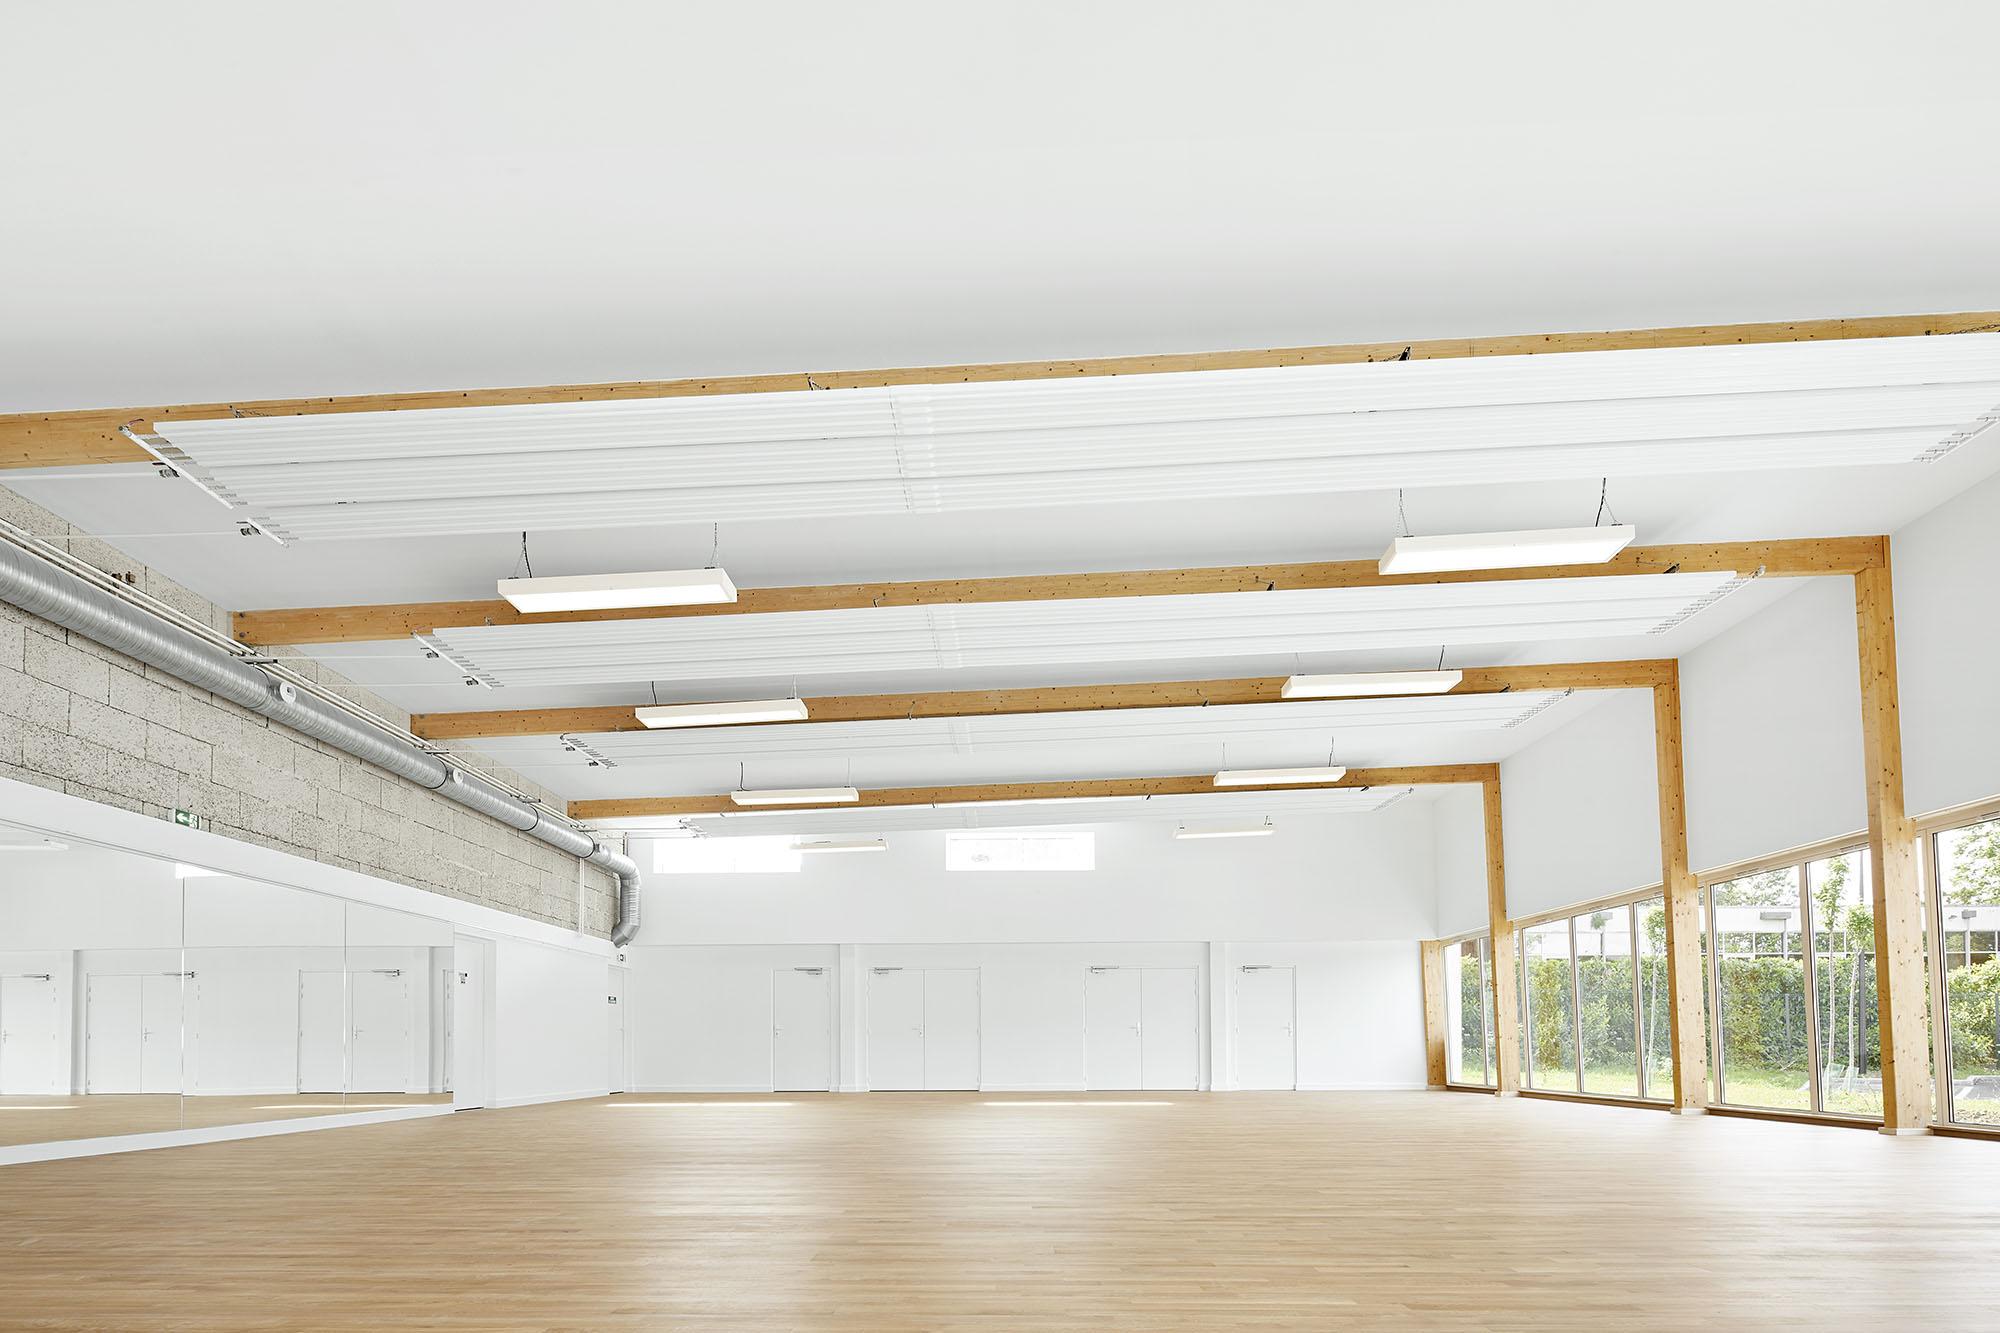 Pierre Chevet sports hall – lemoal lemoal architecture paysage - Photo by Elodie Dupuis